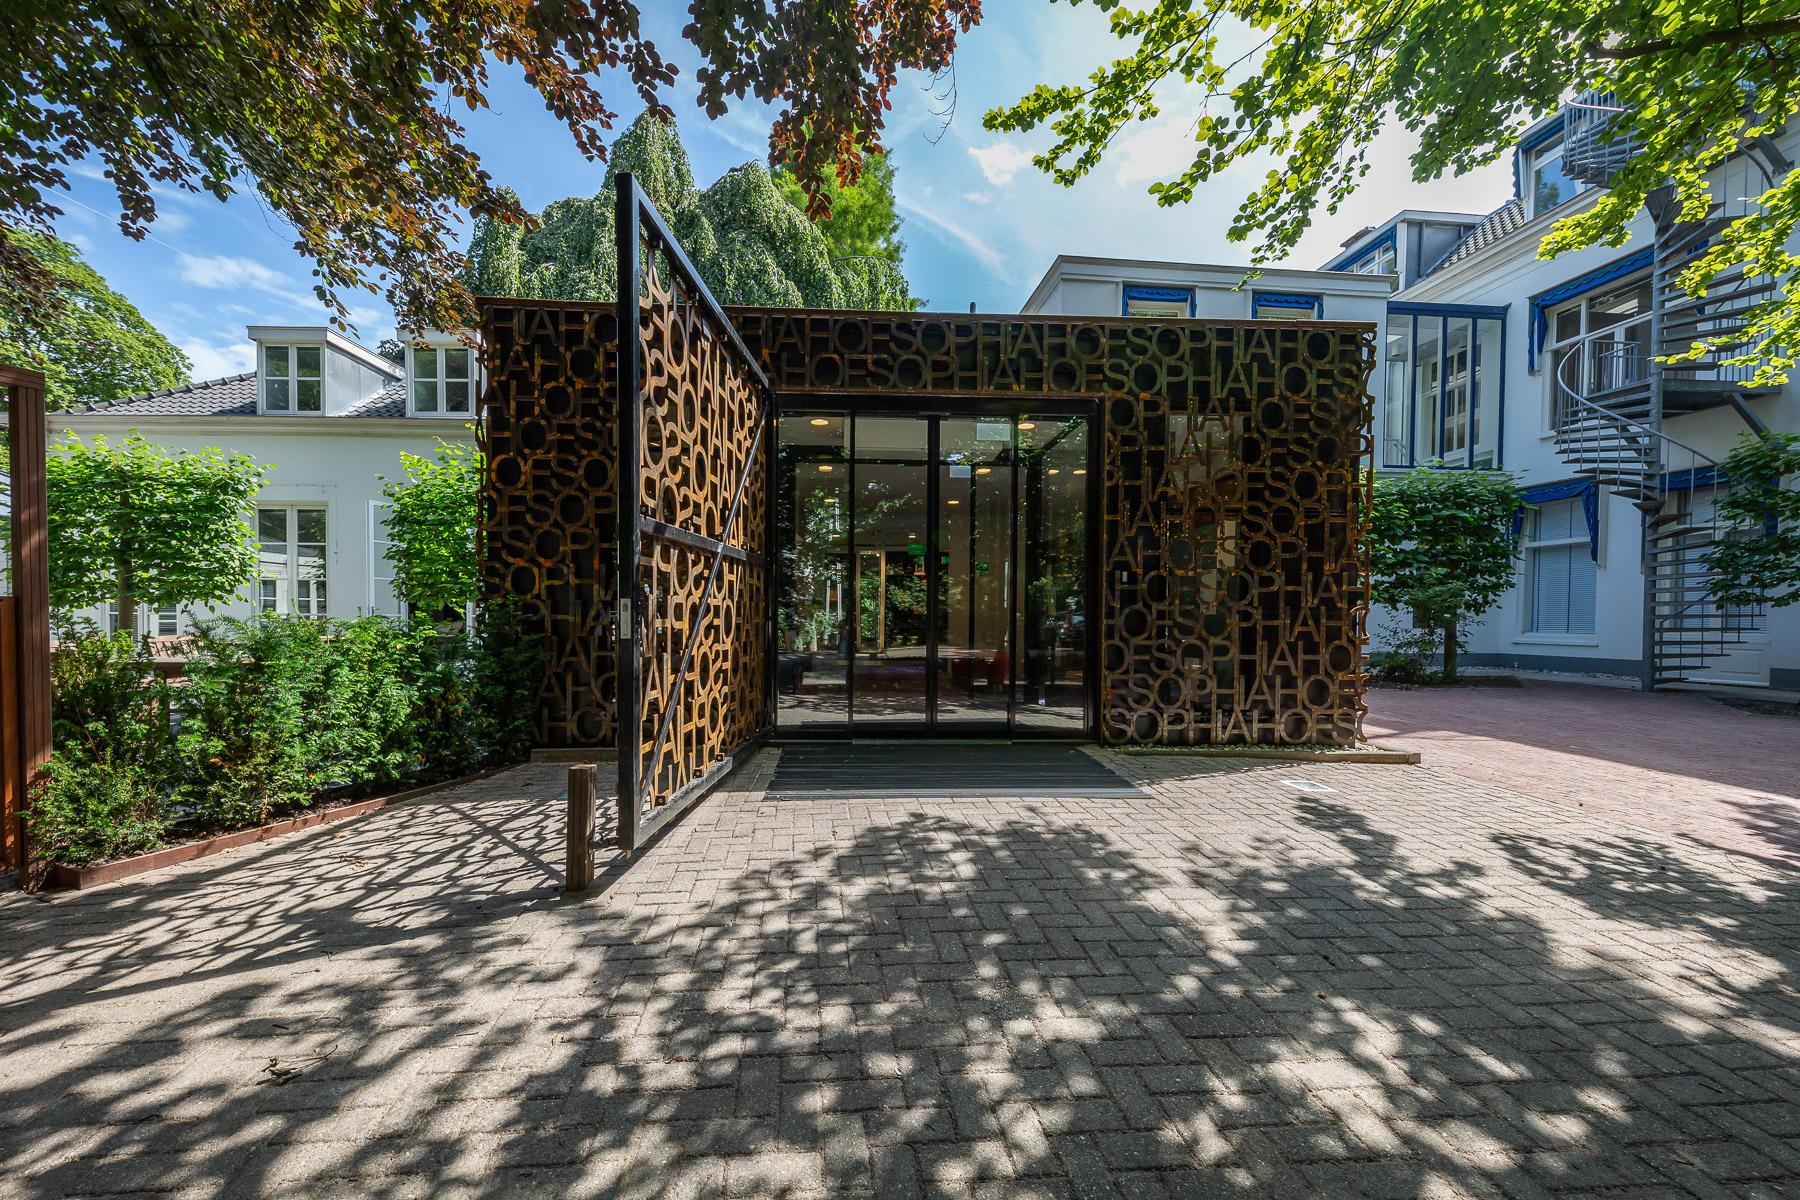 Museum Sophiahof Den Haag